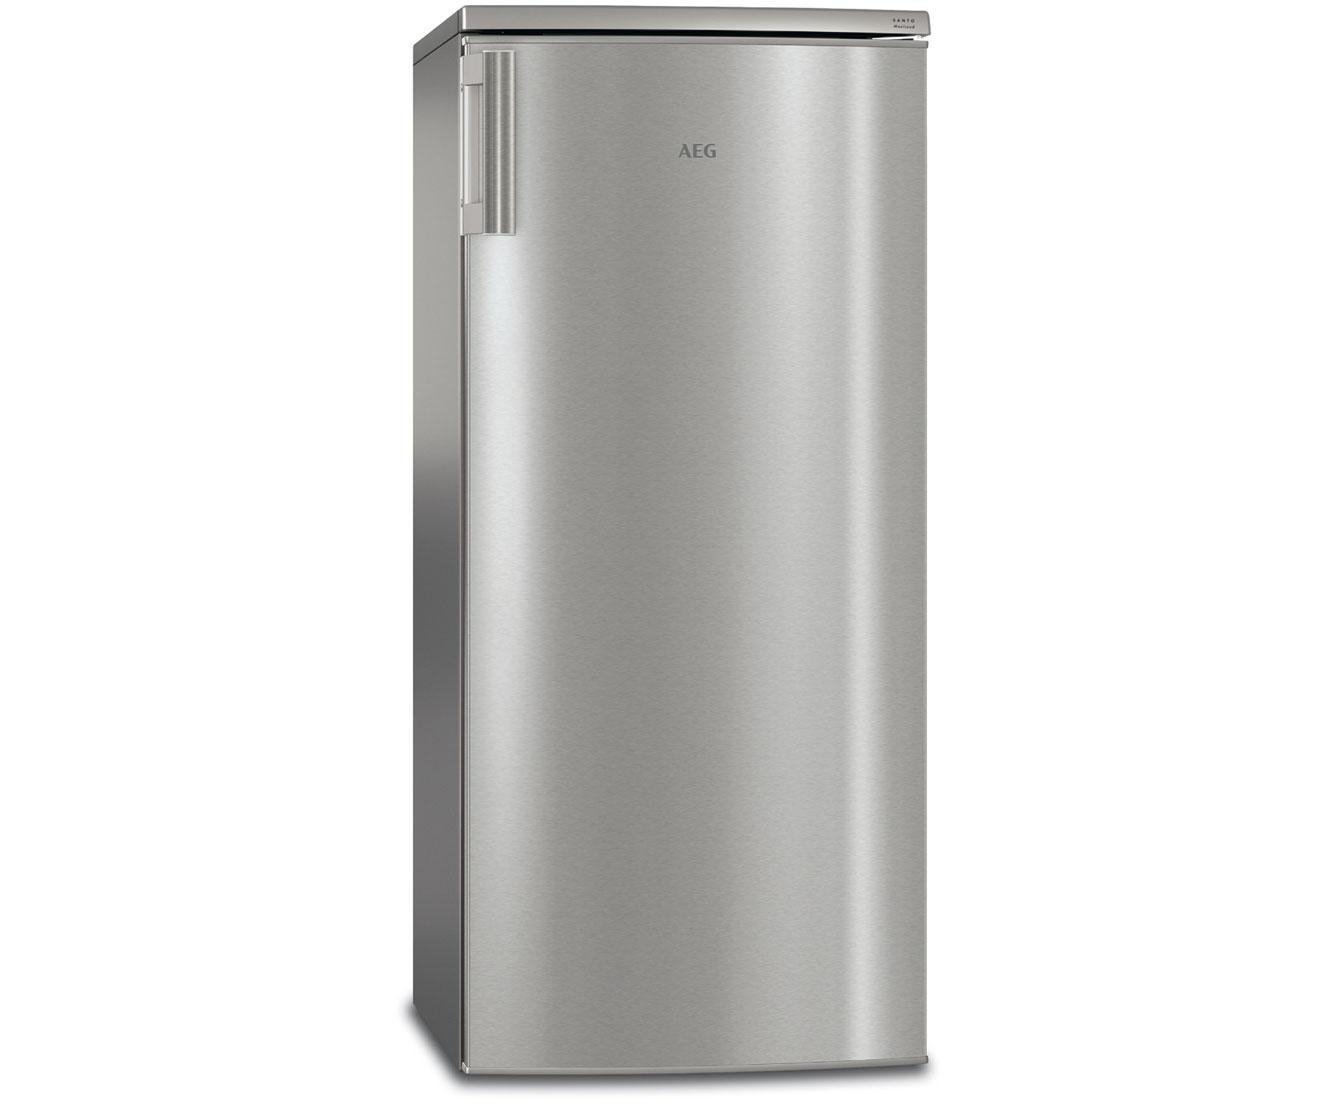 AEG SANTO RFB52412AX Kühlschränke - Edelstahl